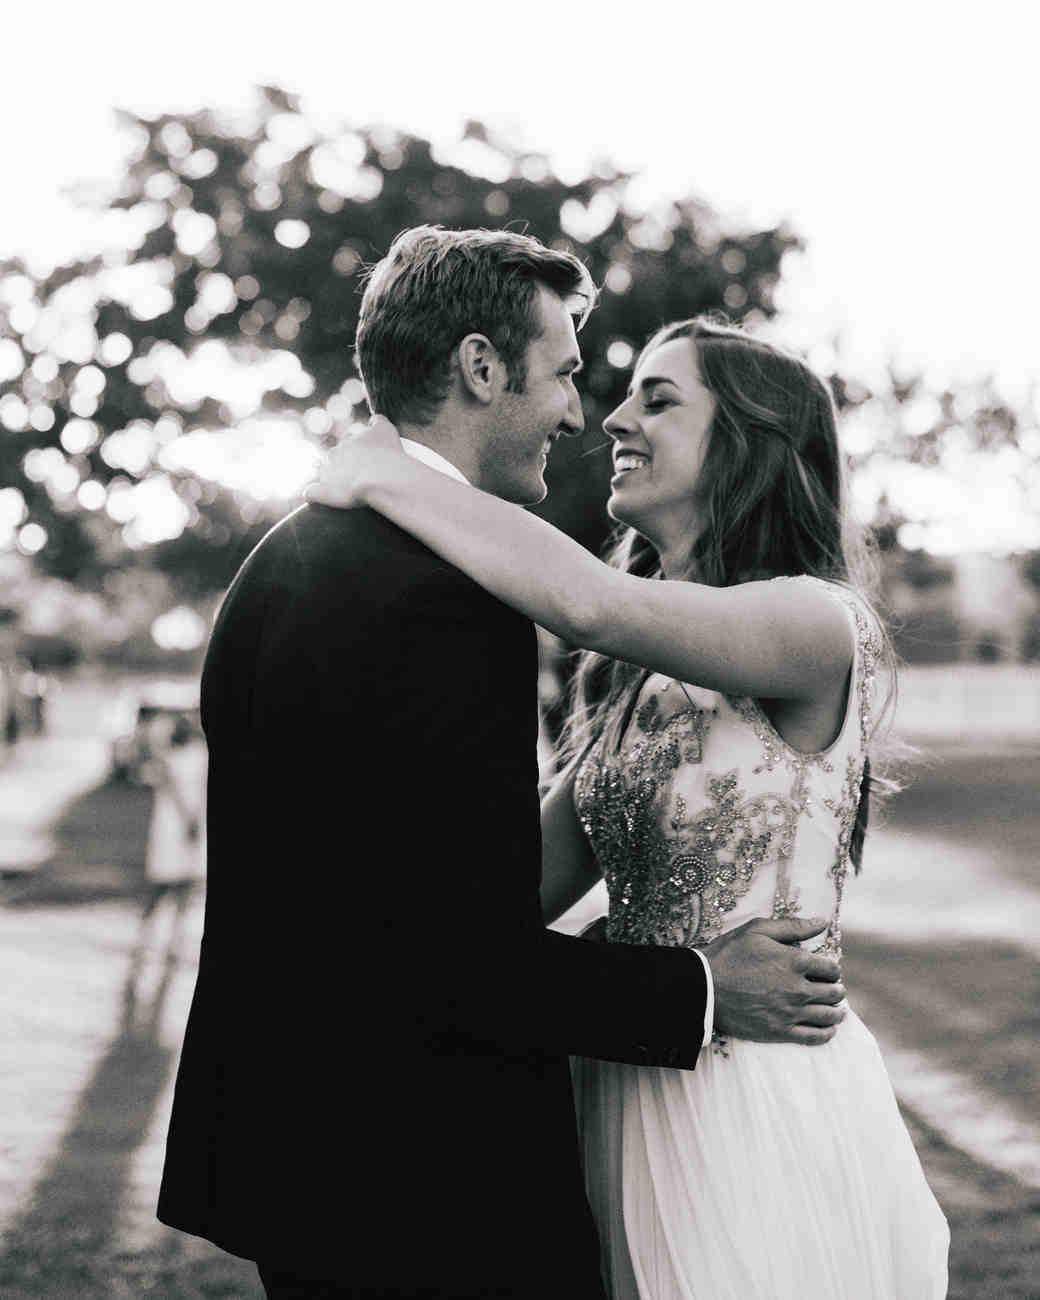 mackenzie-boman-wedding-couple-218-s112693-0316.jpg